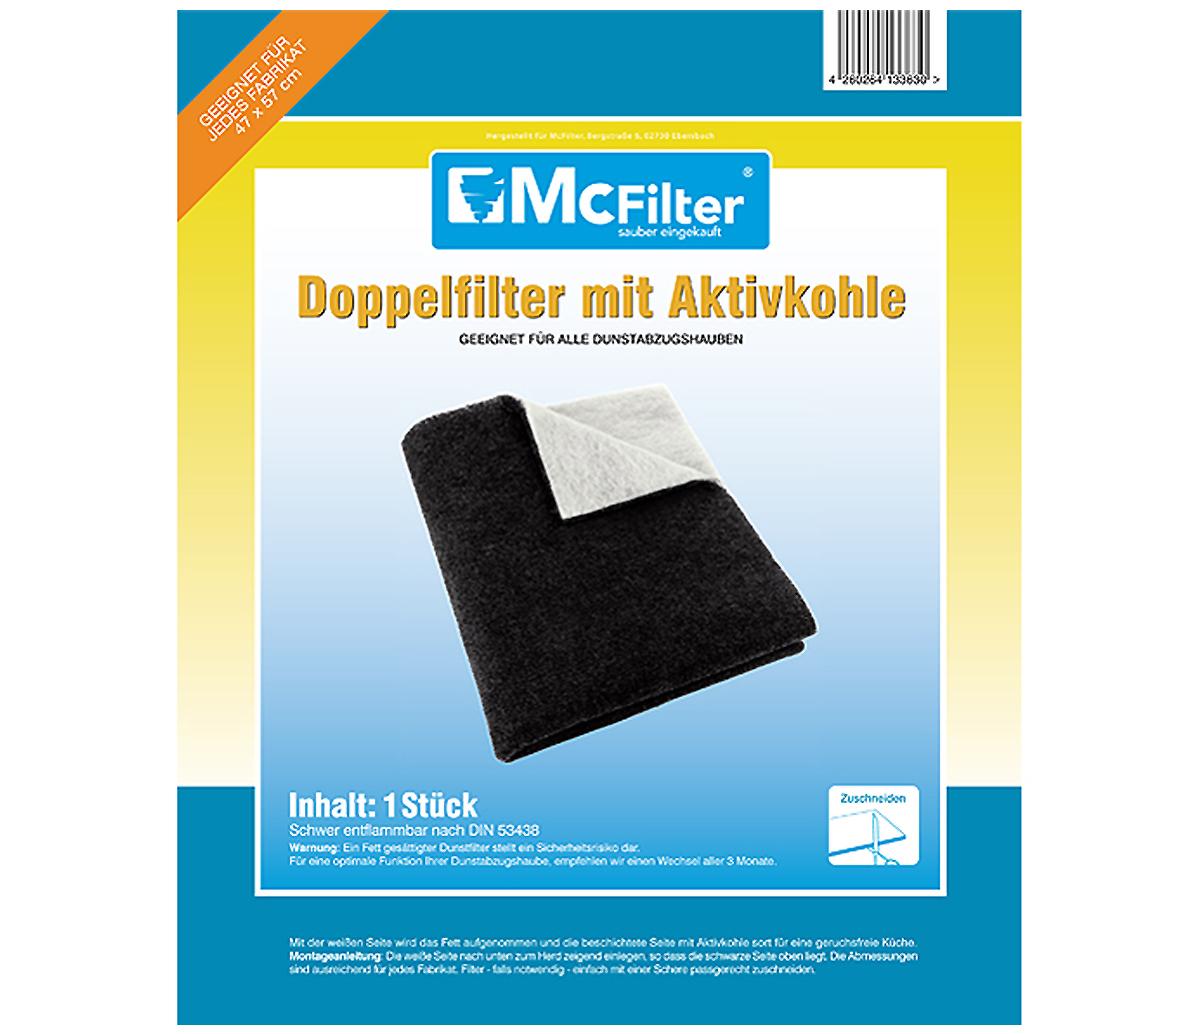 3 Stück Fettfilter Aktivkohlefilter Kohefilter Dunstfilter Filter Abzugshaube